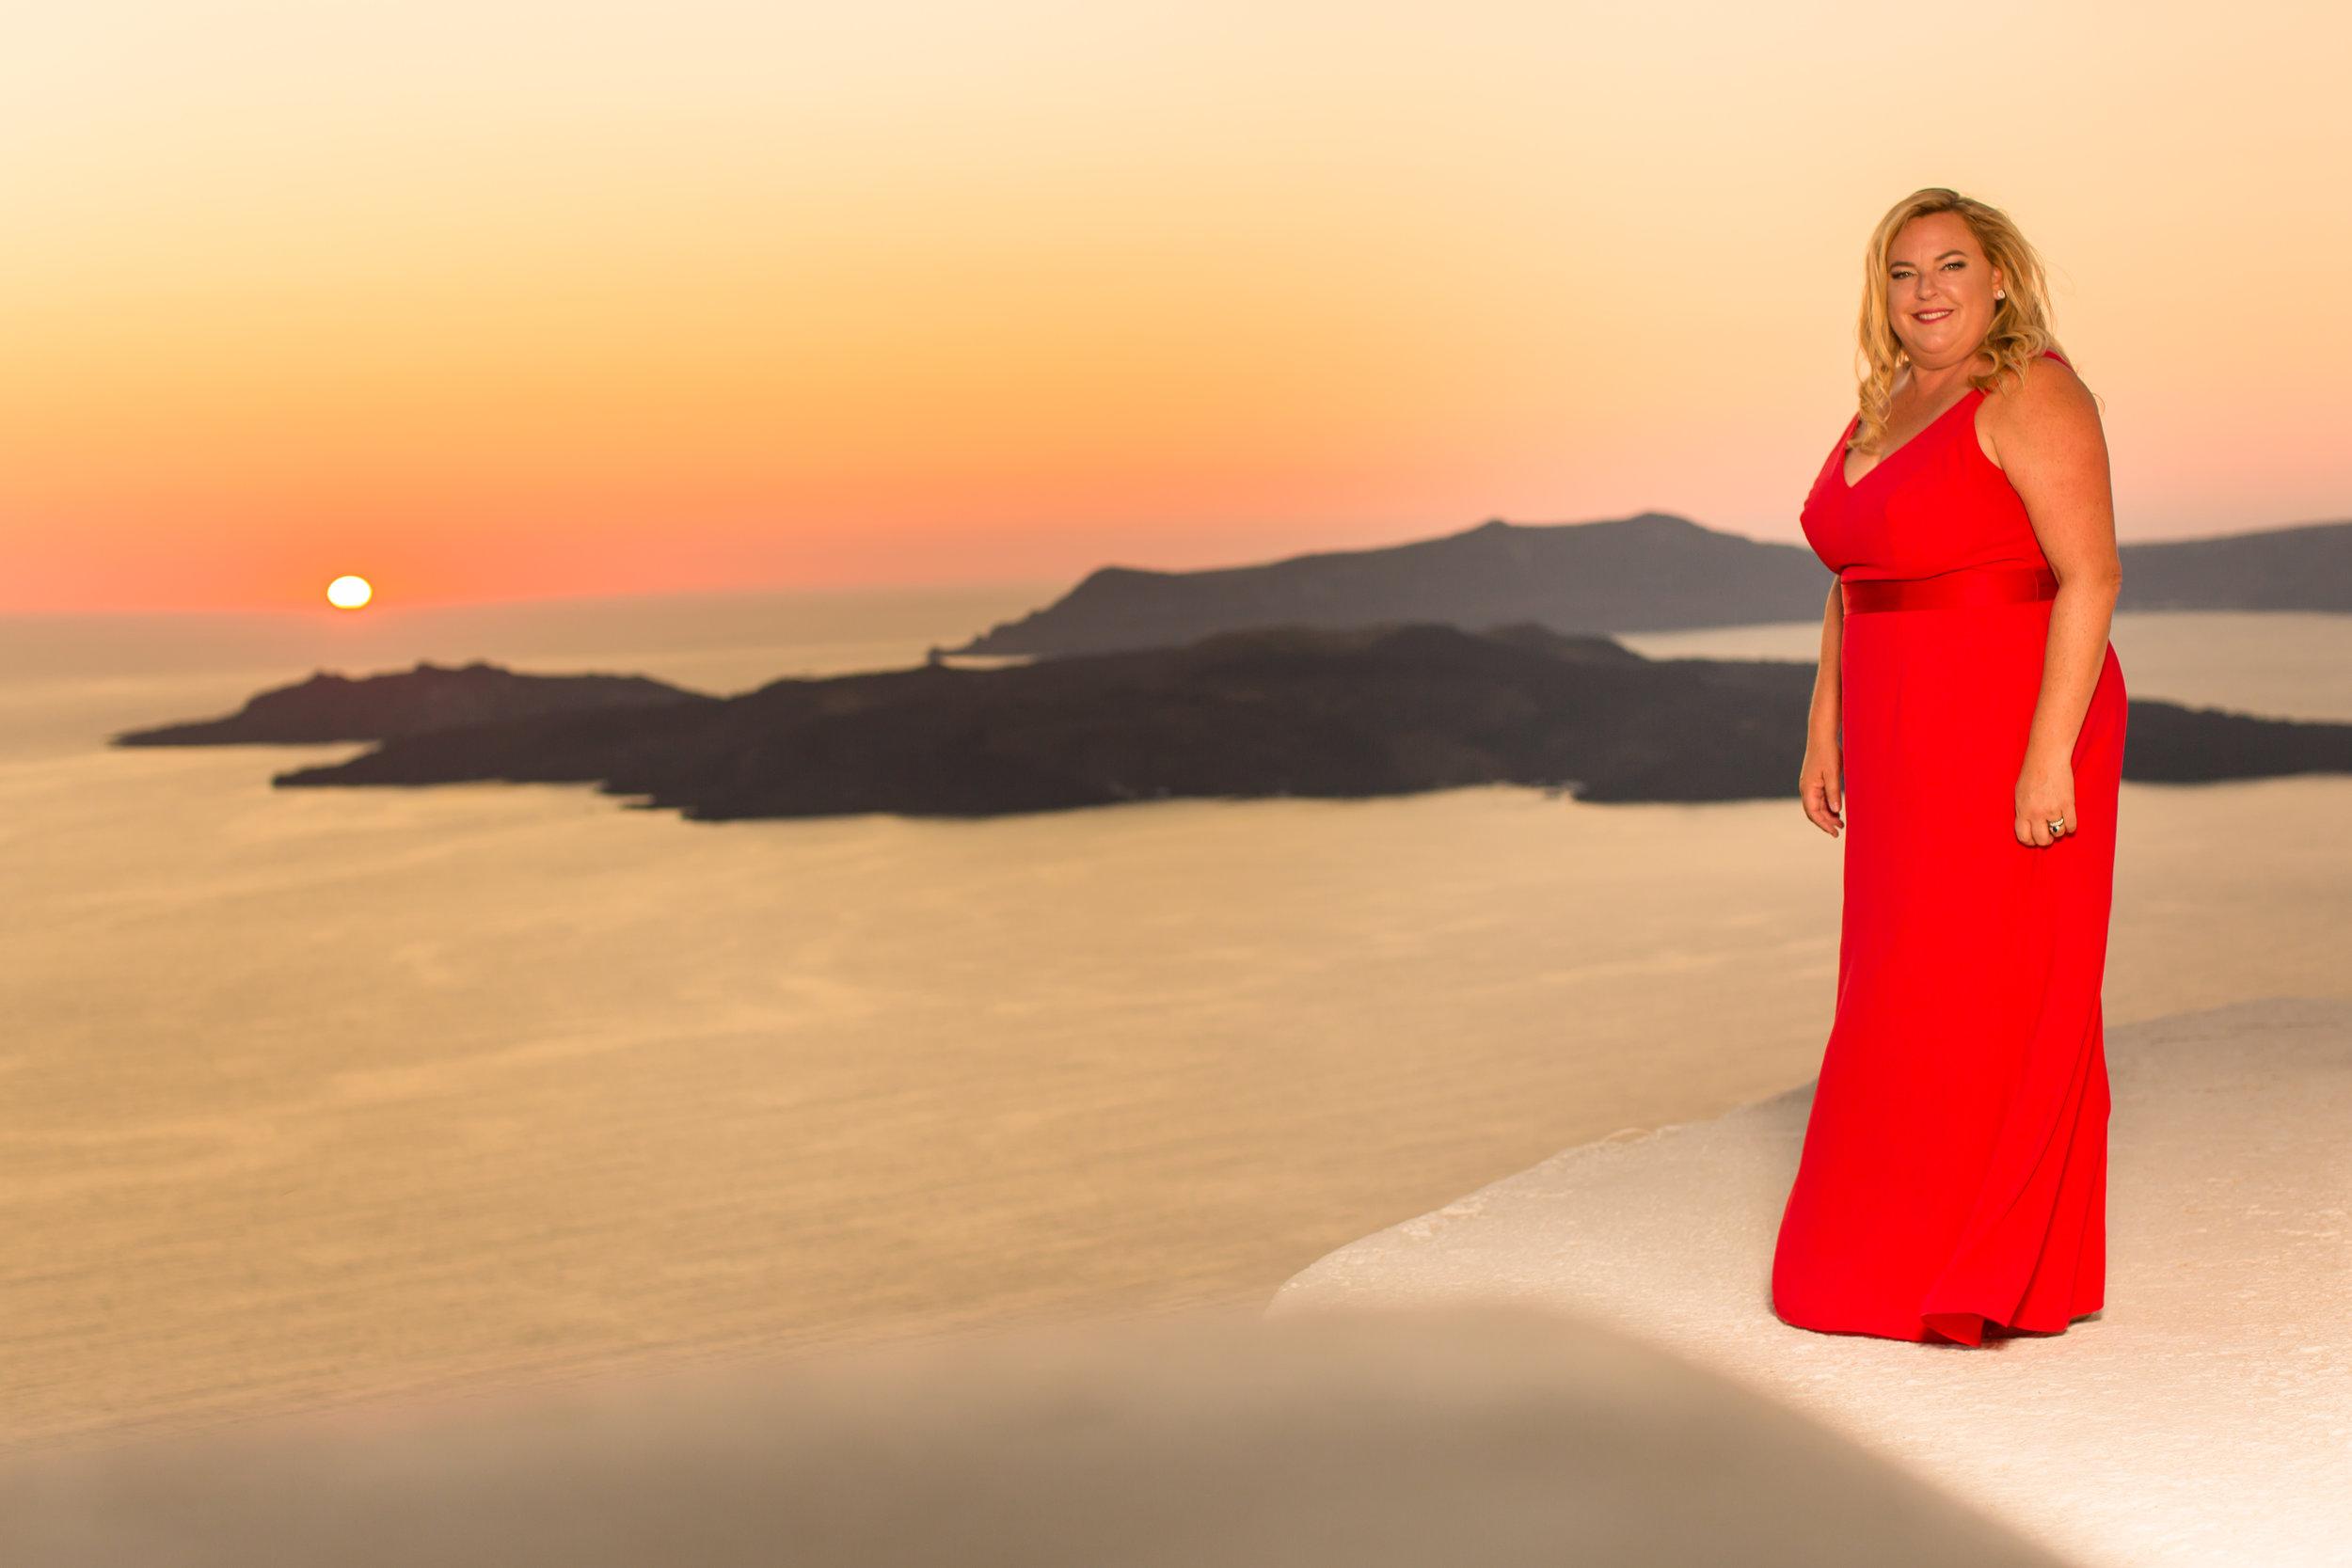 red-dress-santorini-greece.jpg